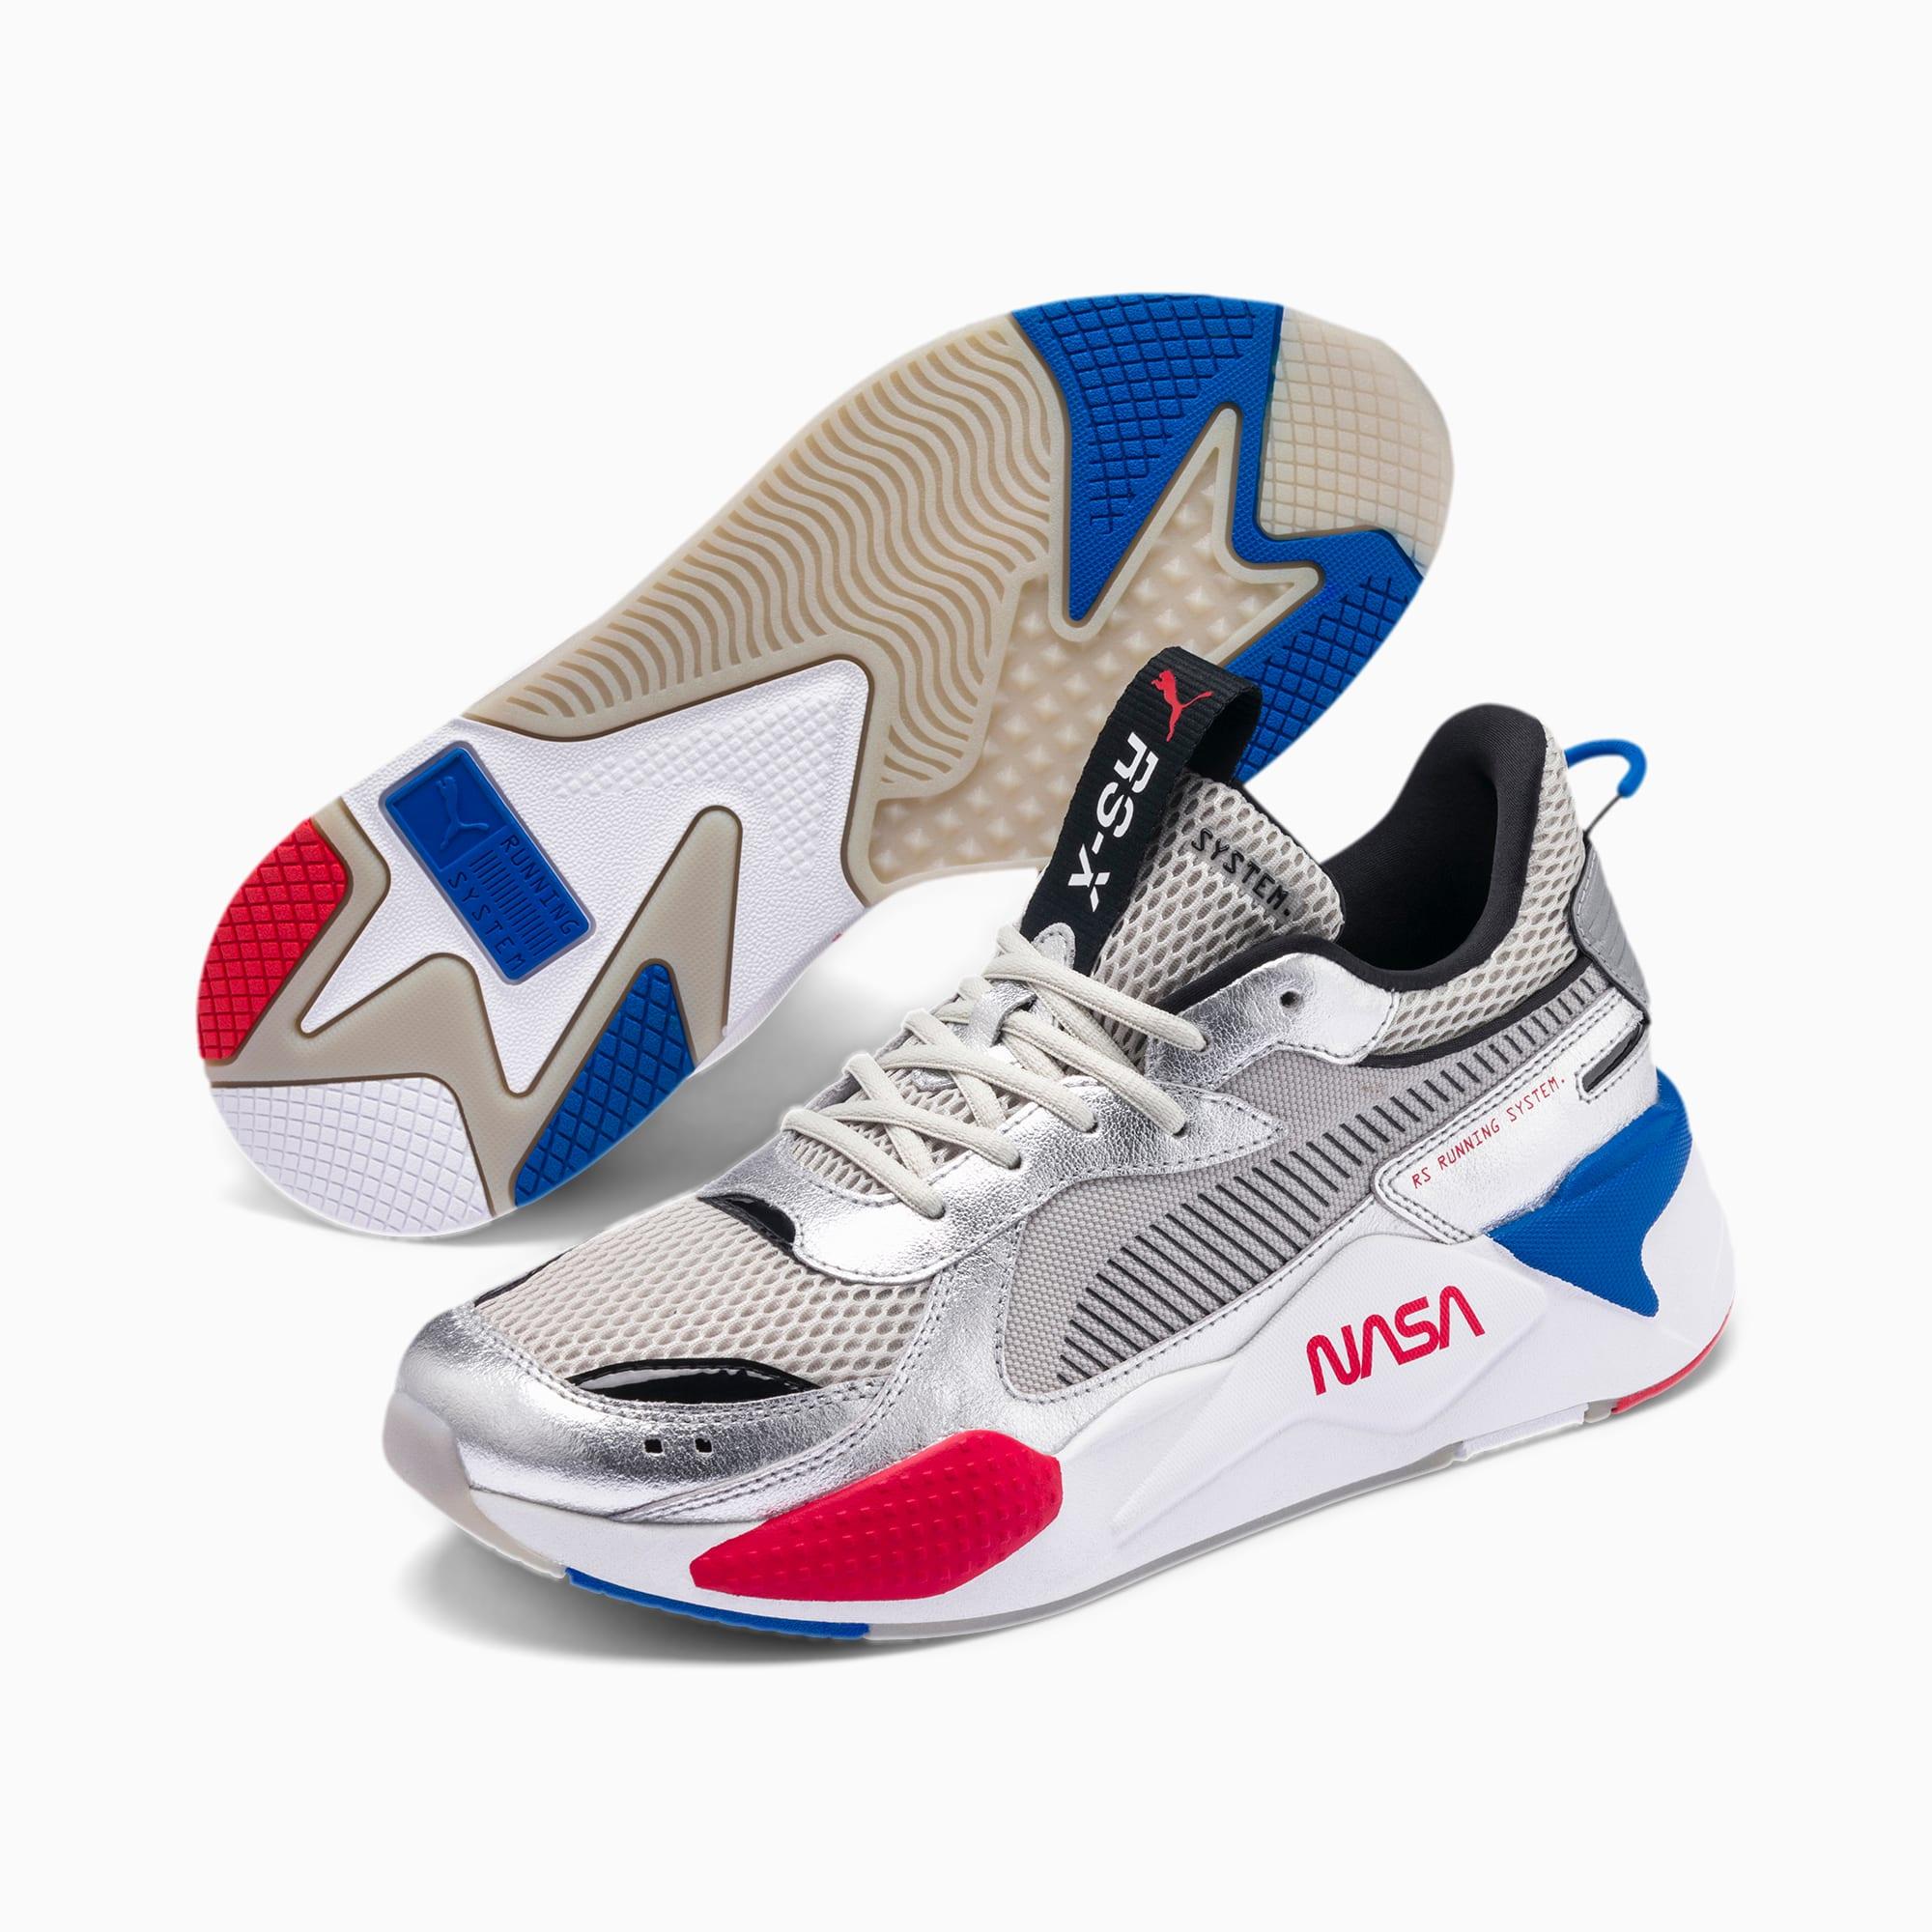 RS-X Space Agency Sneakers